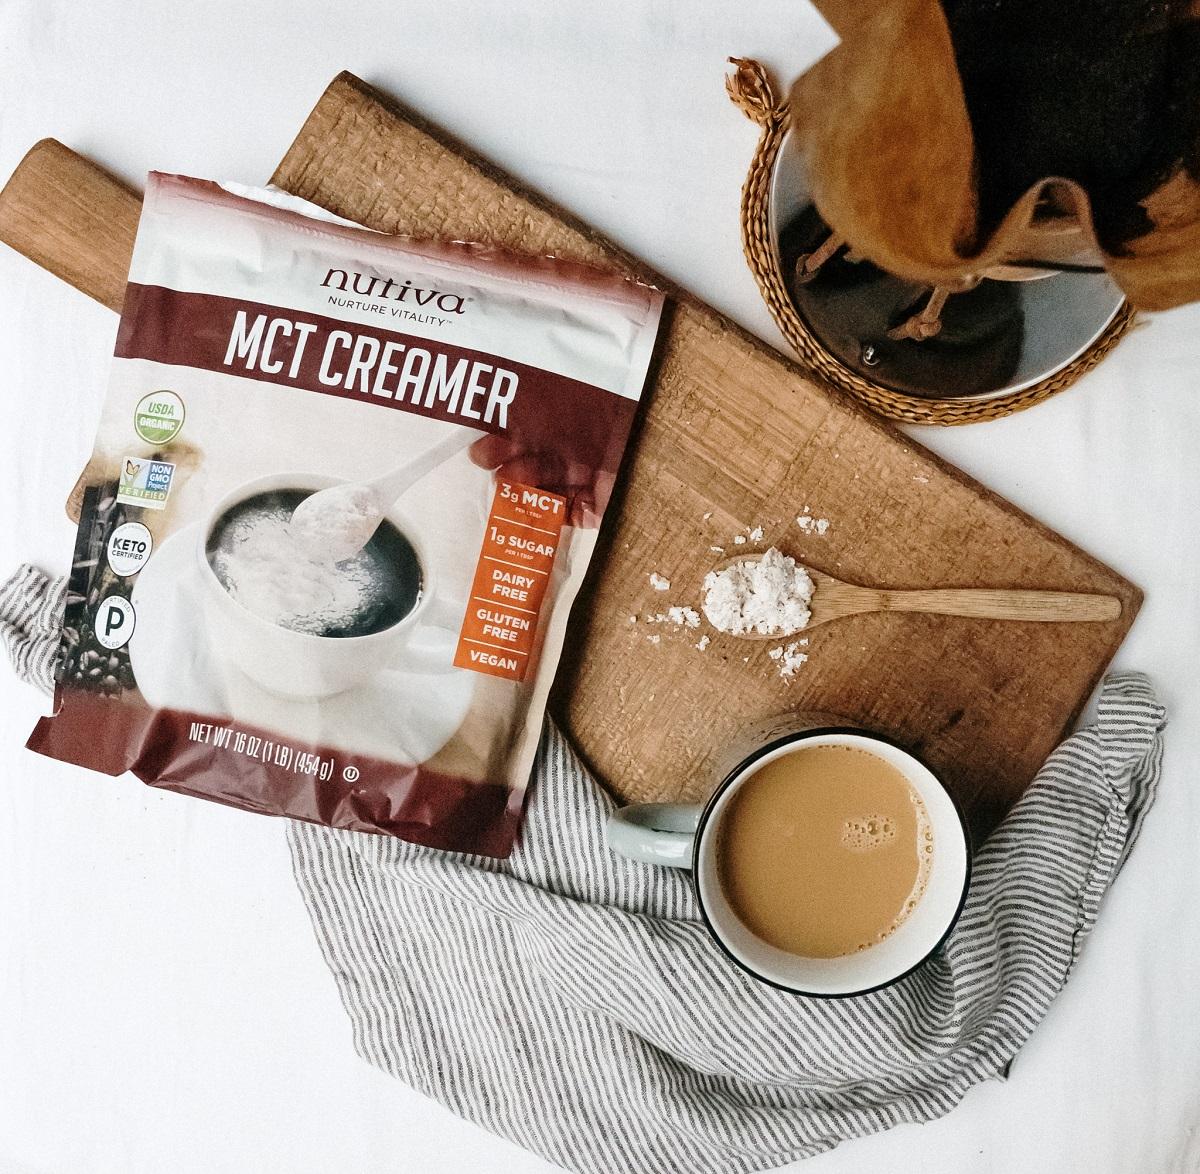 Organic MCT Creamer Lifestyle Image